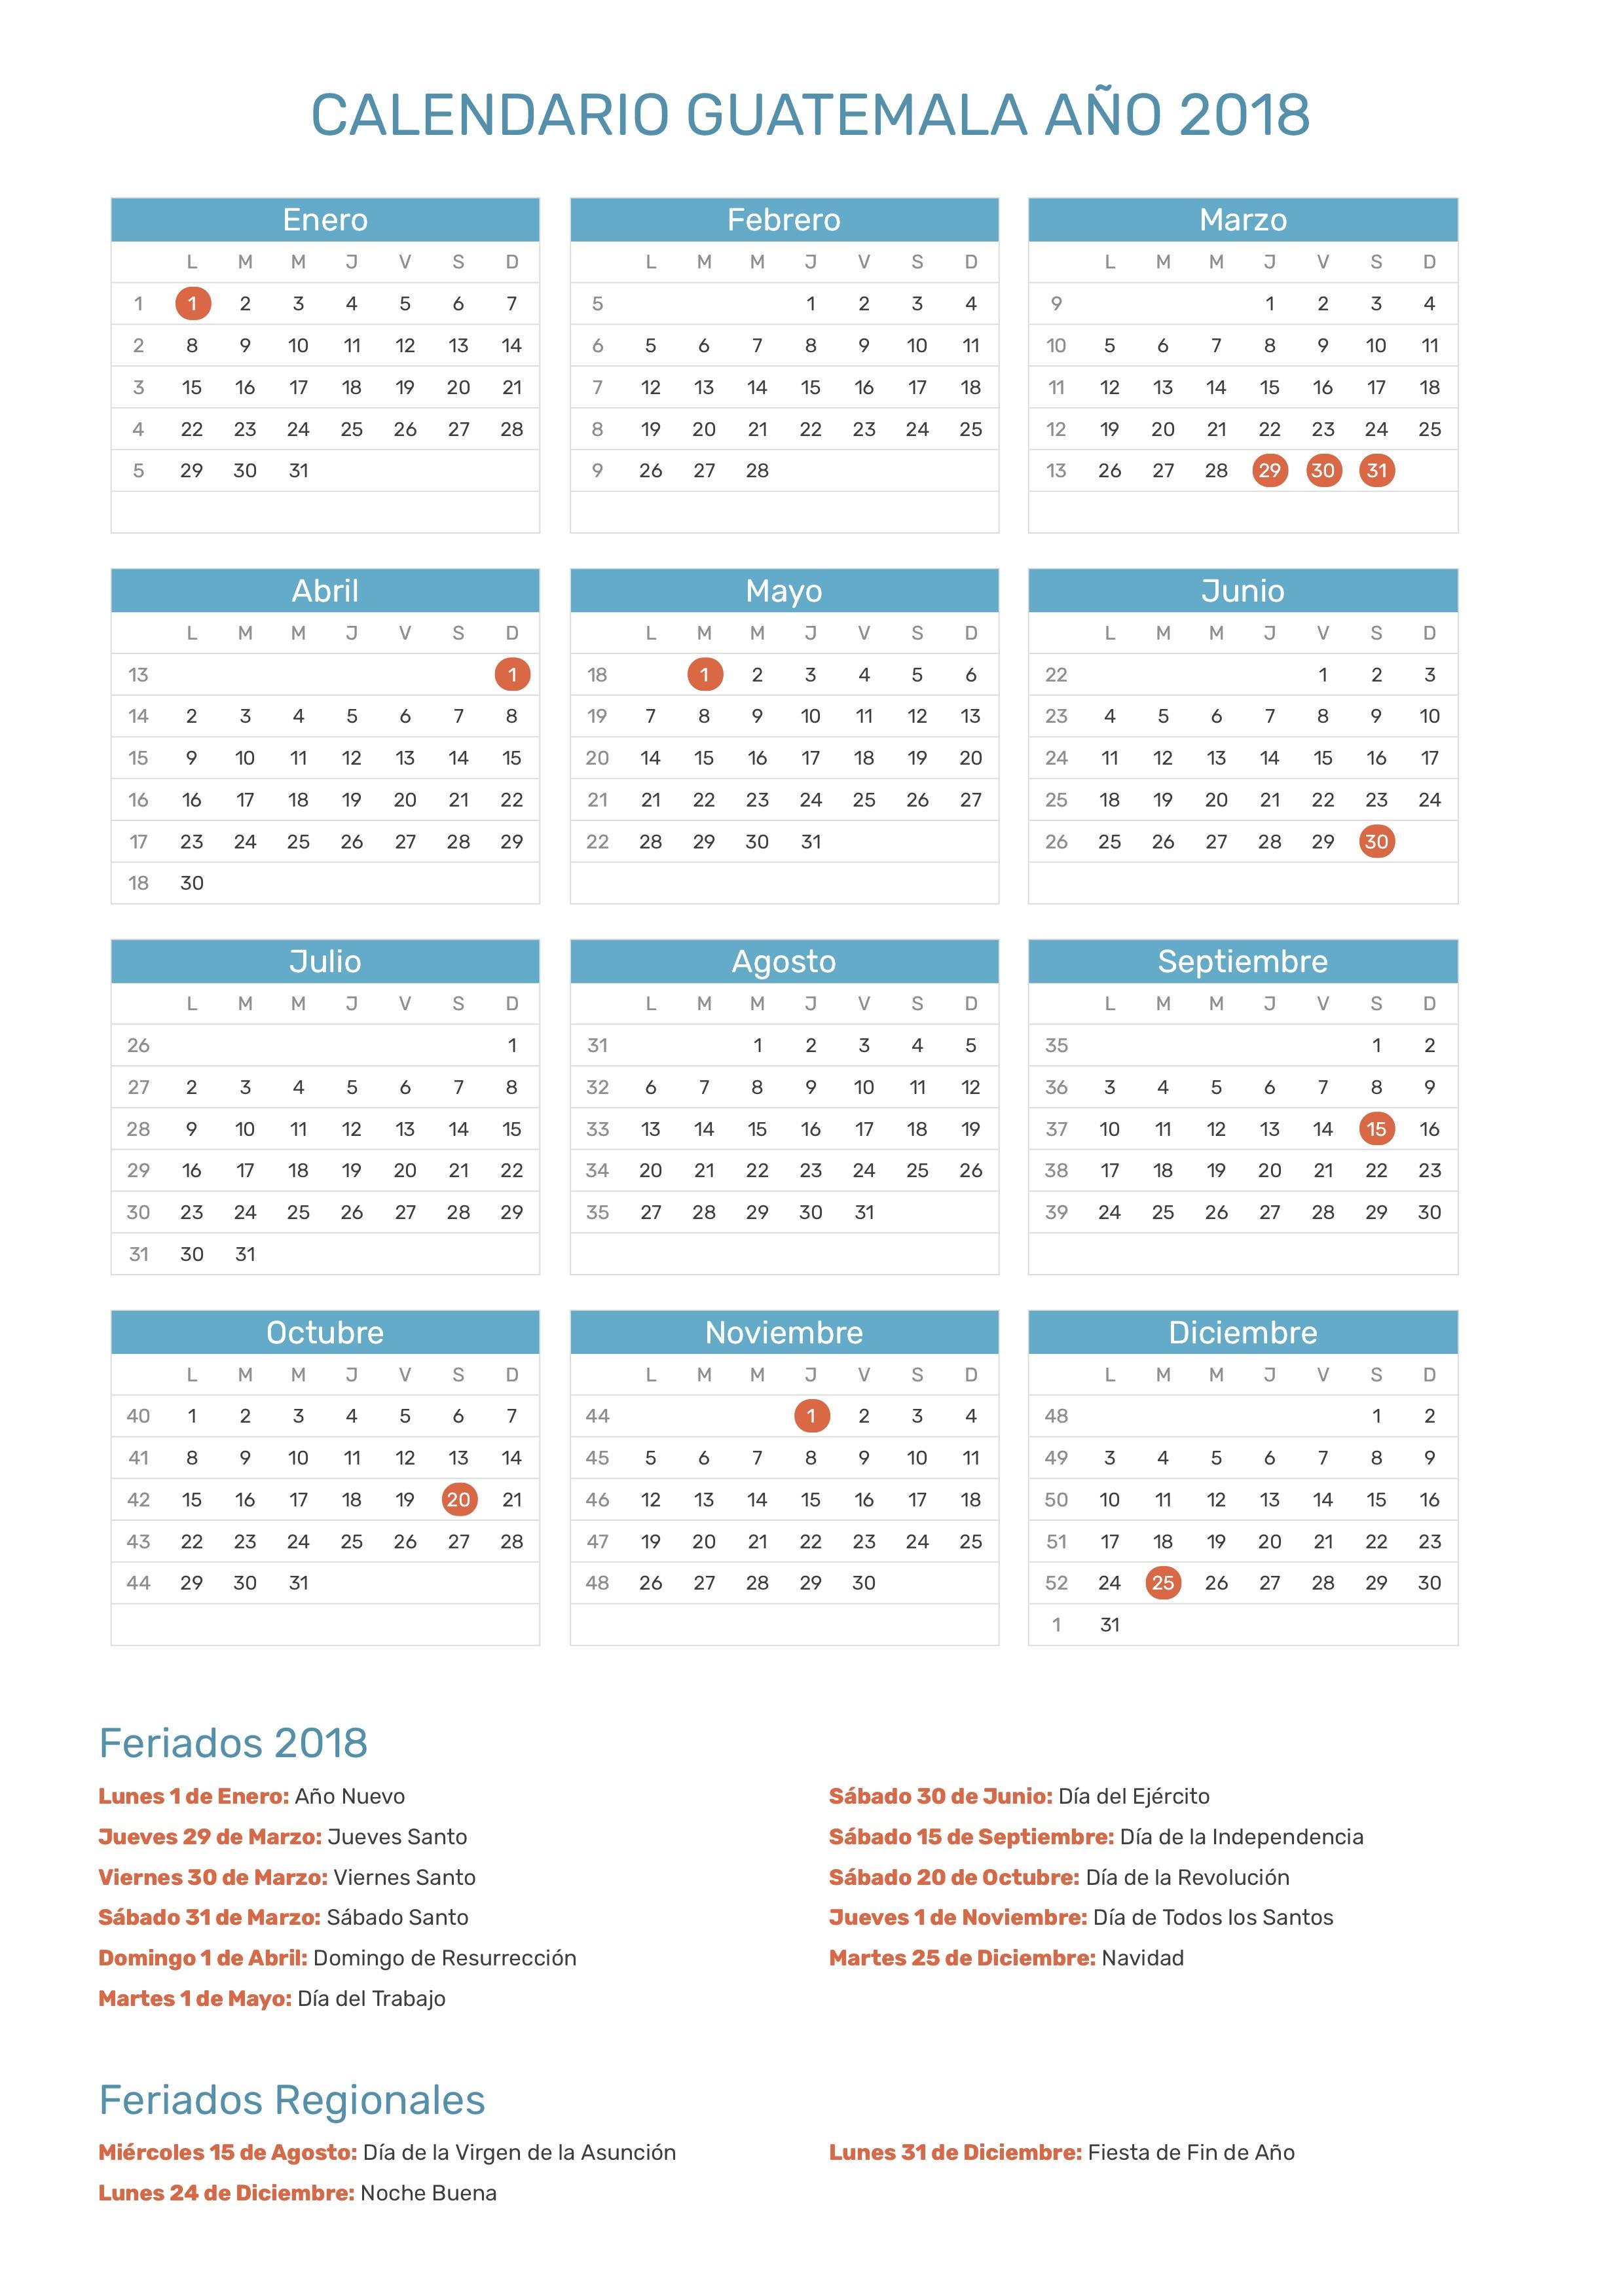 calendario de guatemala a u00f1o 2018